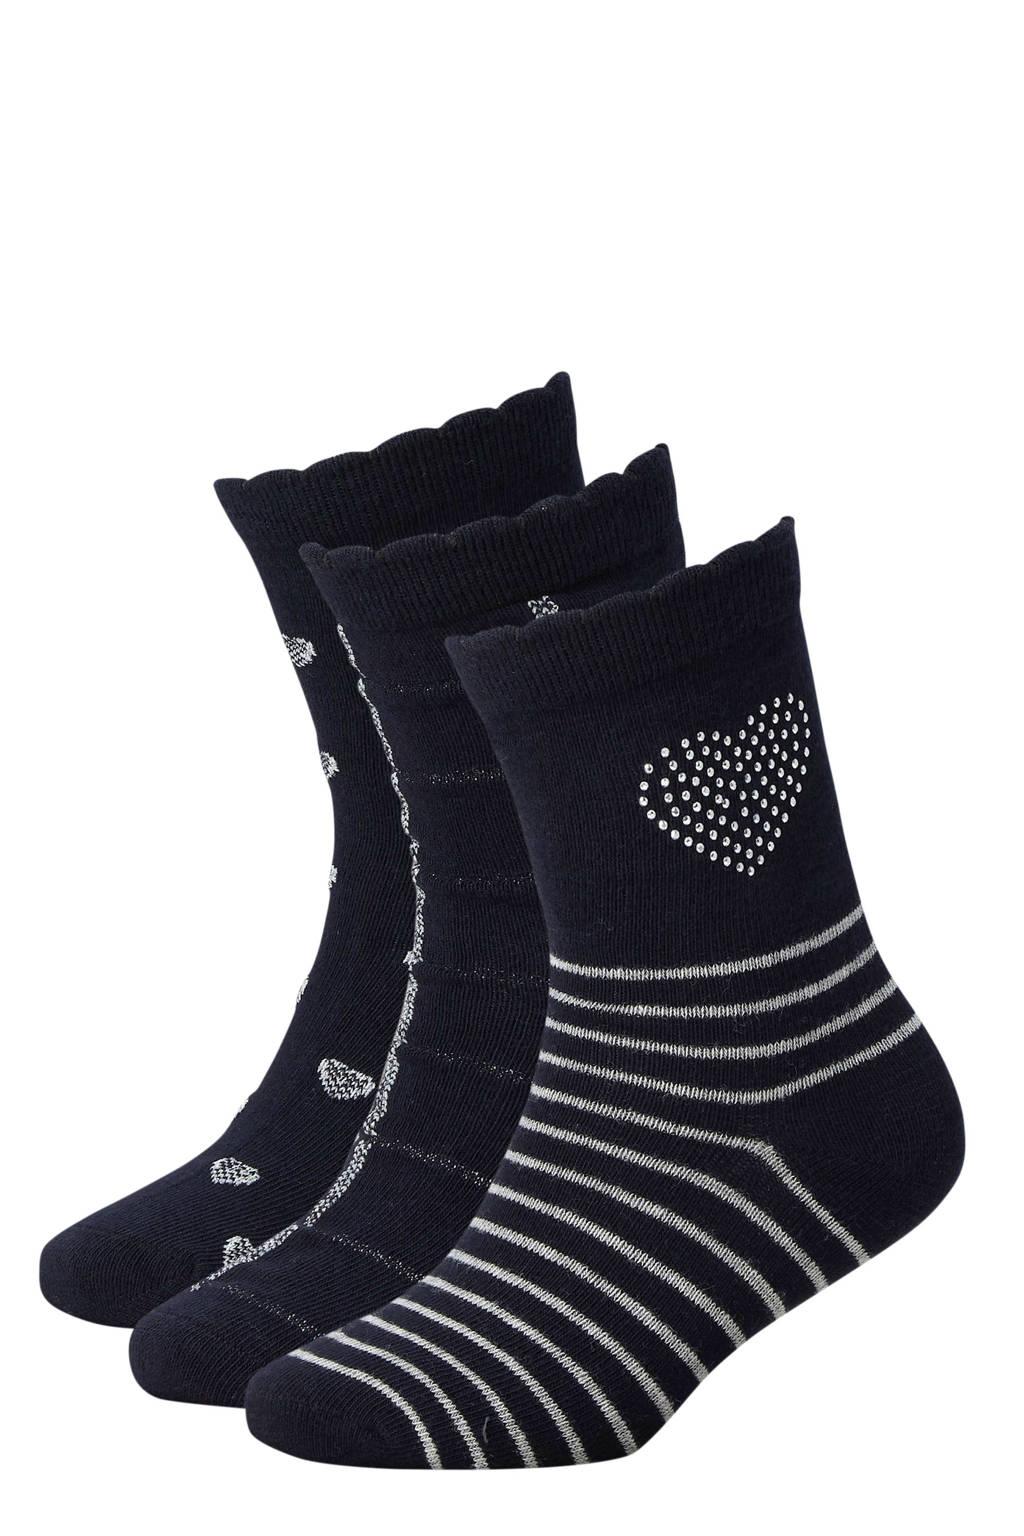 Apollo sokken set van 3 paar marine, Marine